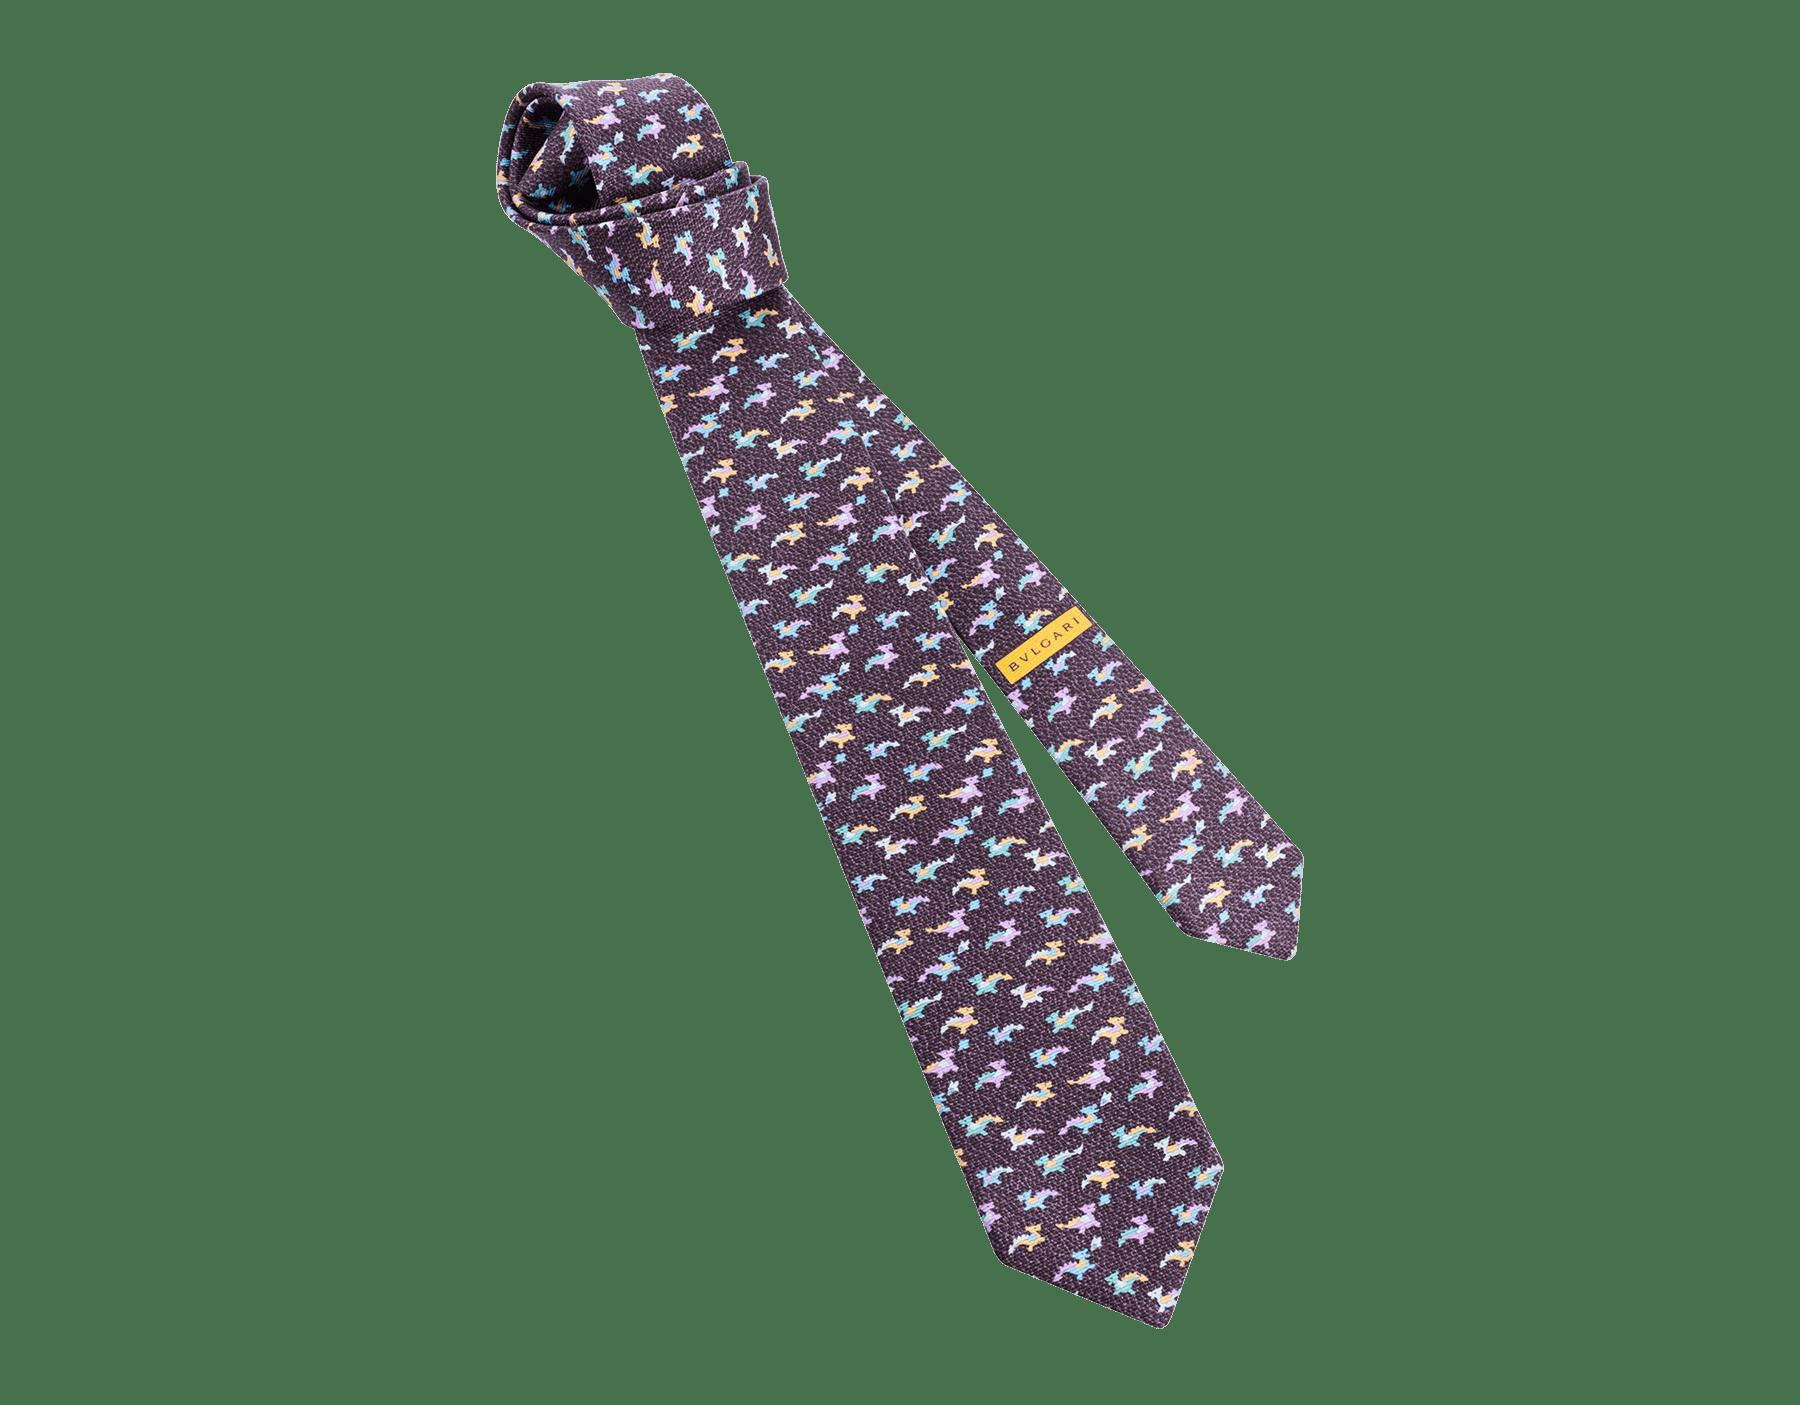 Gravata de sete dobras berinjela com padrão Dragonheart em fina sarja de seda estampada. 243629 image 1